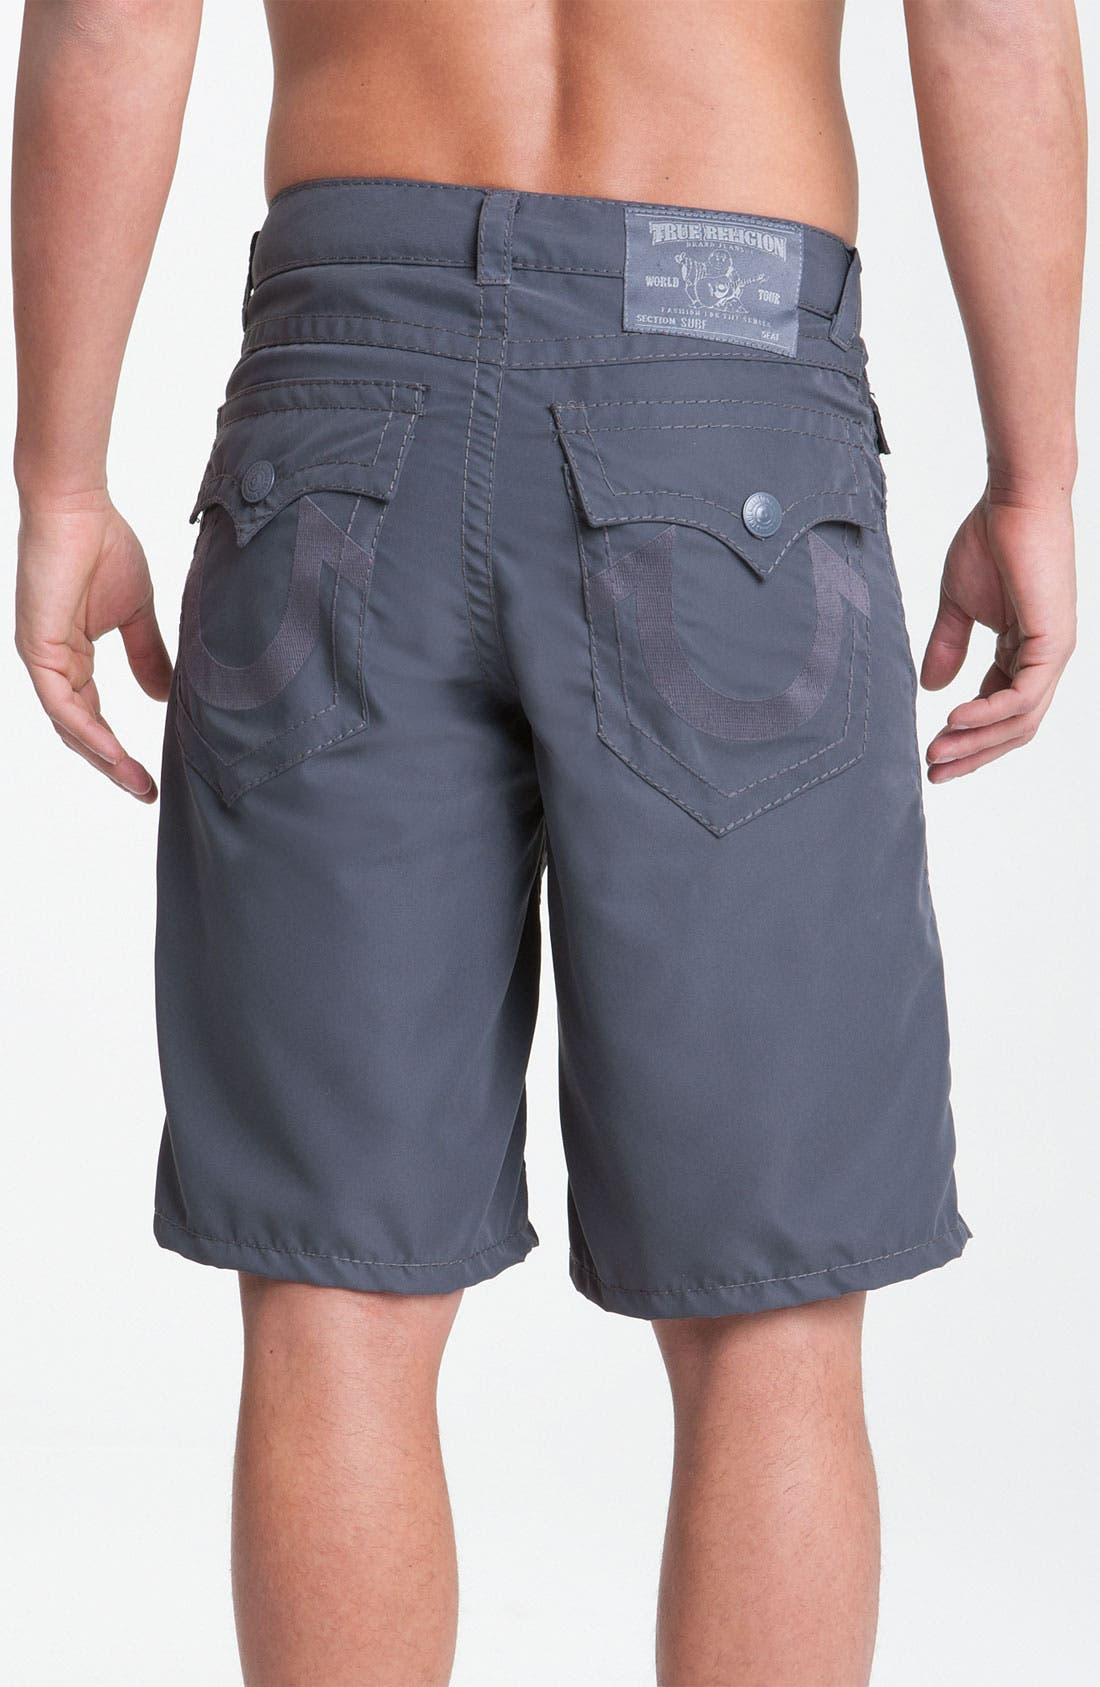 Main Image - True Religion Brand Jeans 'PCH' Board Shorts